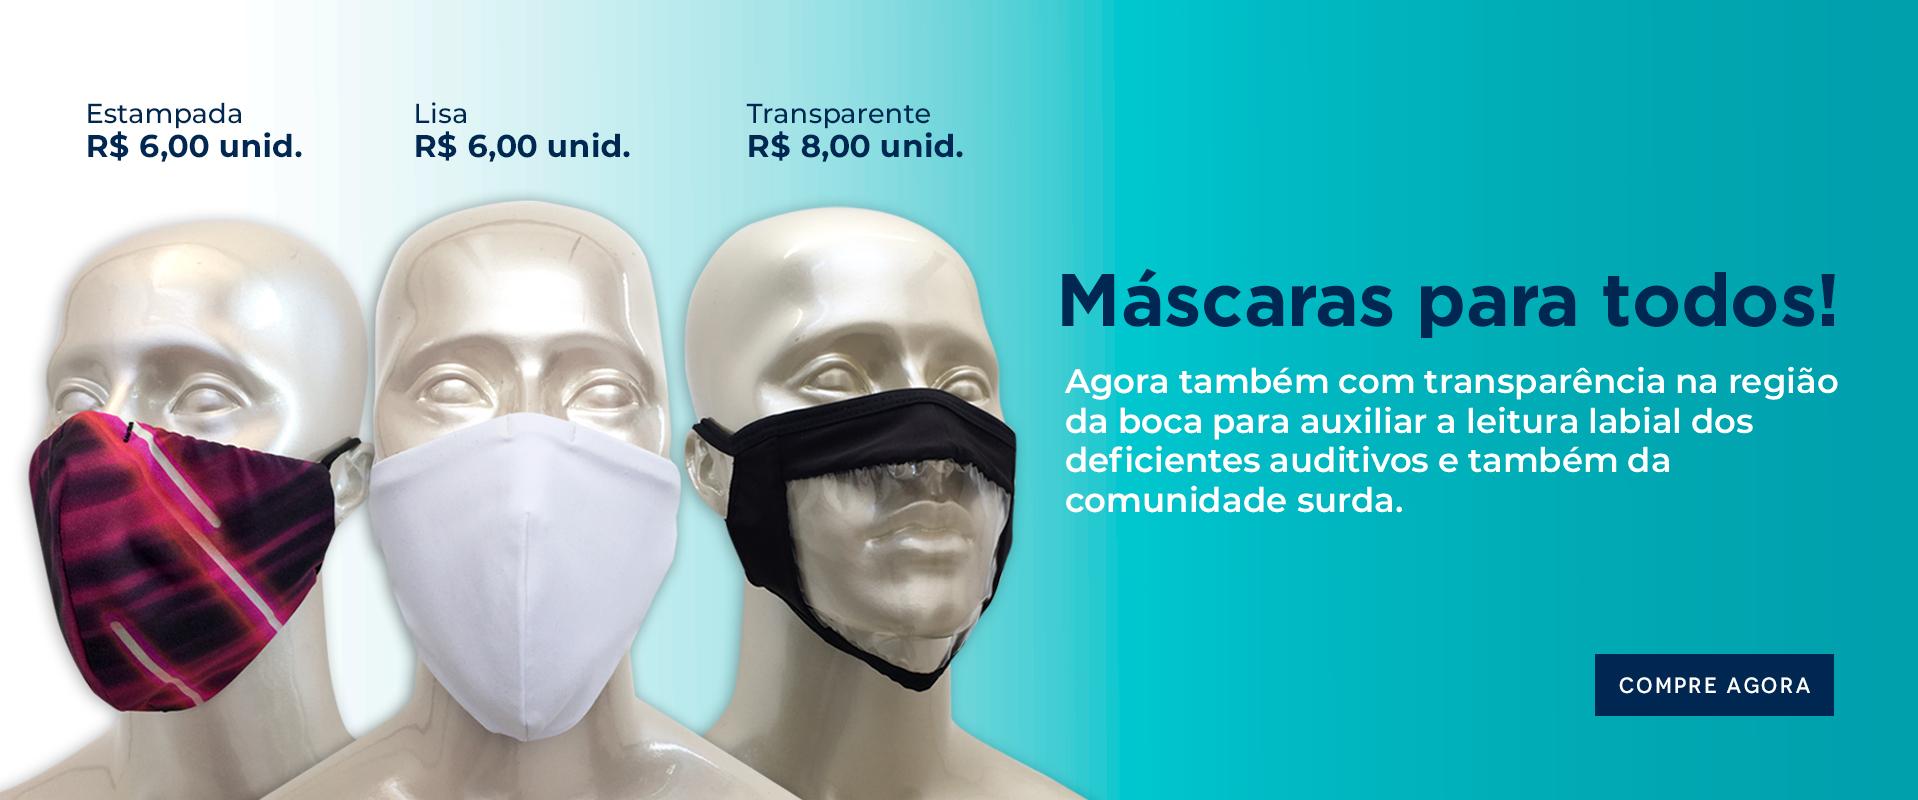 Mascara atributos